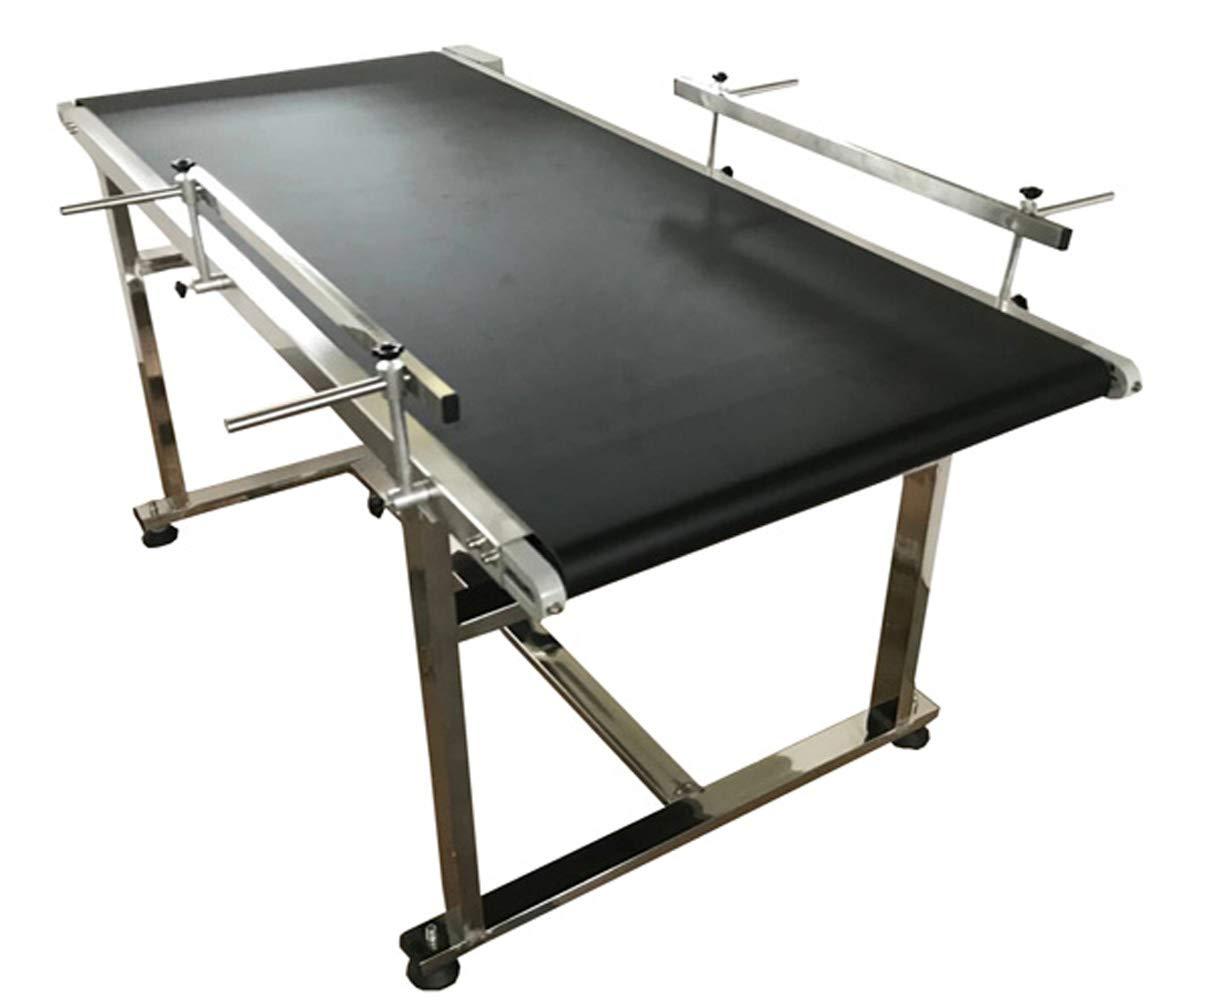 INTBUYING Electric Conveyor Belt Machine 59